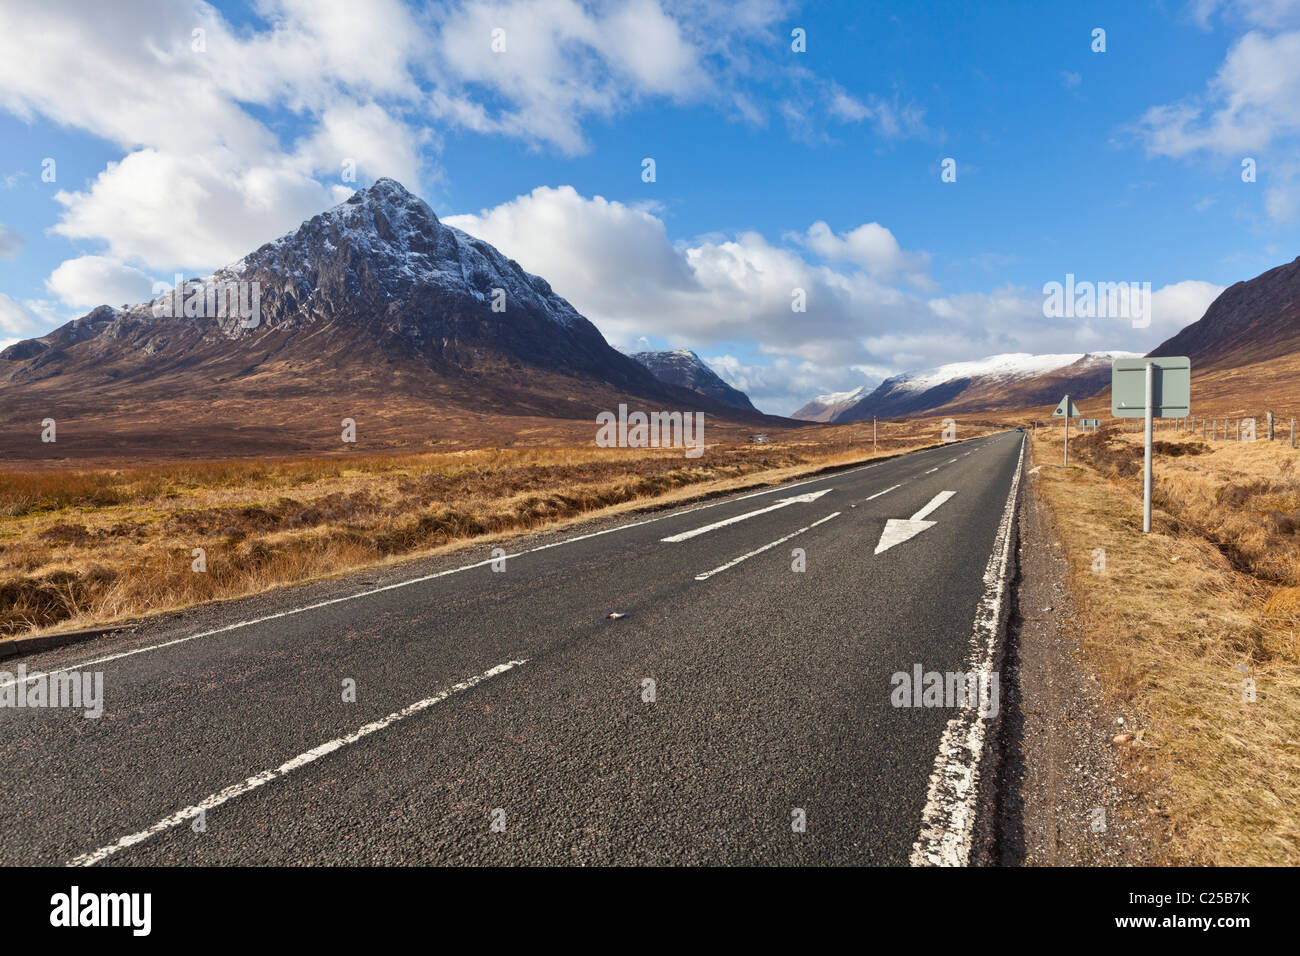 Buachaille Etive Mor Glen Etive and Glen Coe junction Rannoch moor top Scottish Highlands Scotland UK GB EU Europe - Stock Image